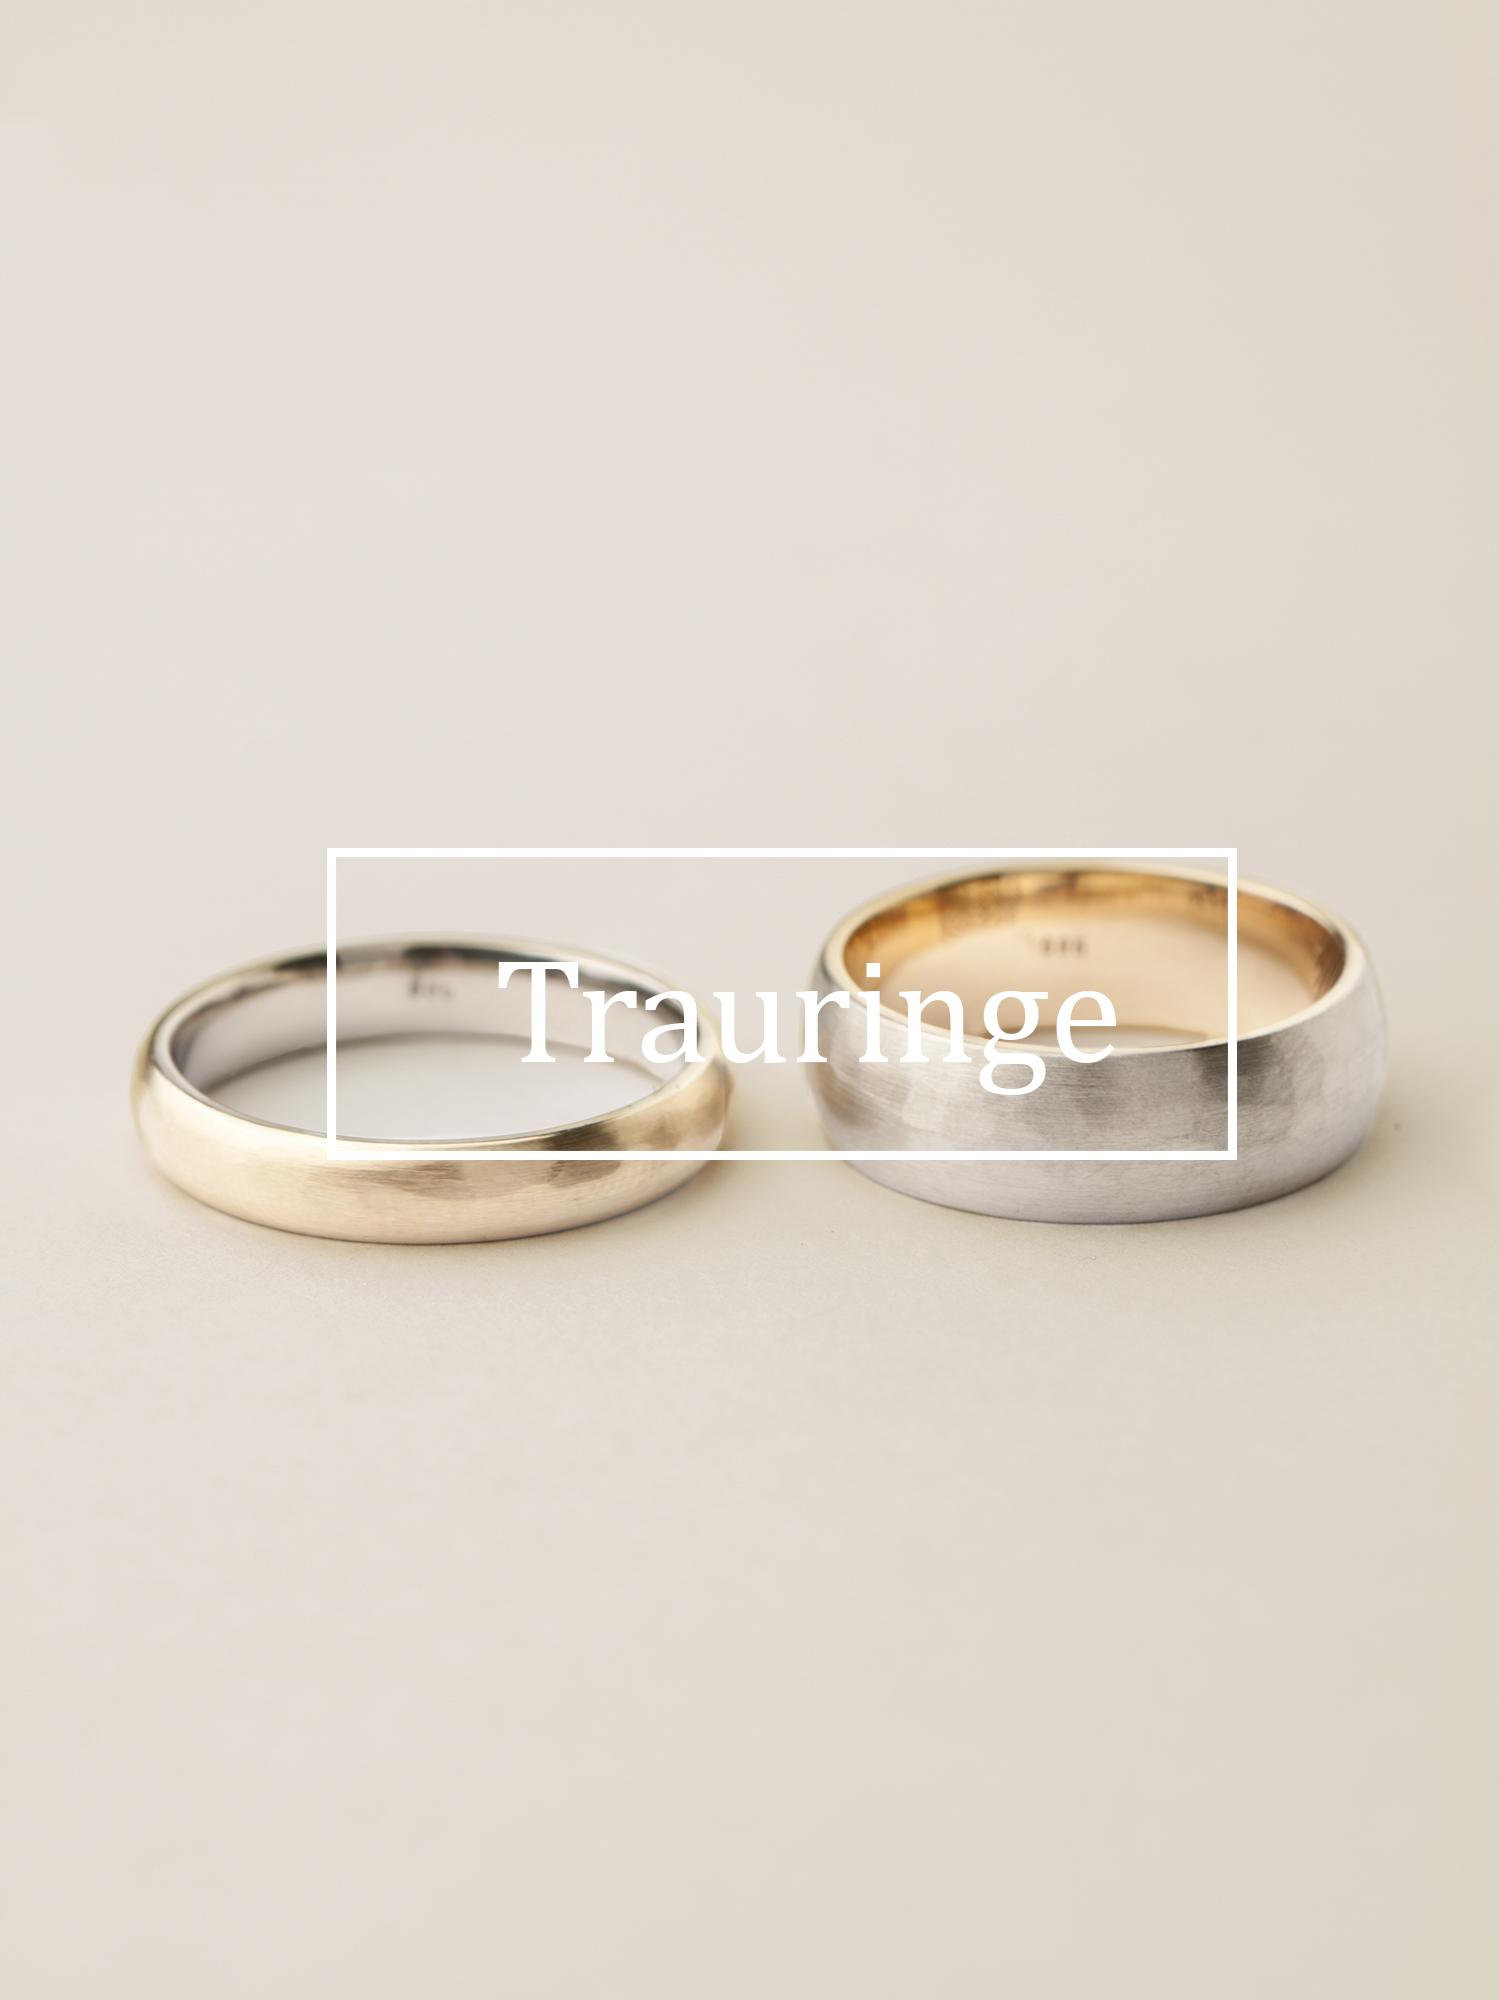 Christina-Pauls-Trauringe-Eheringe.jpg